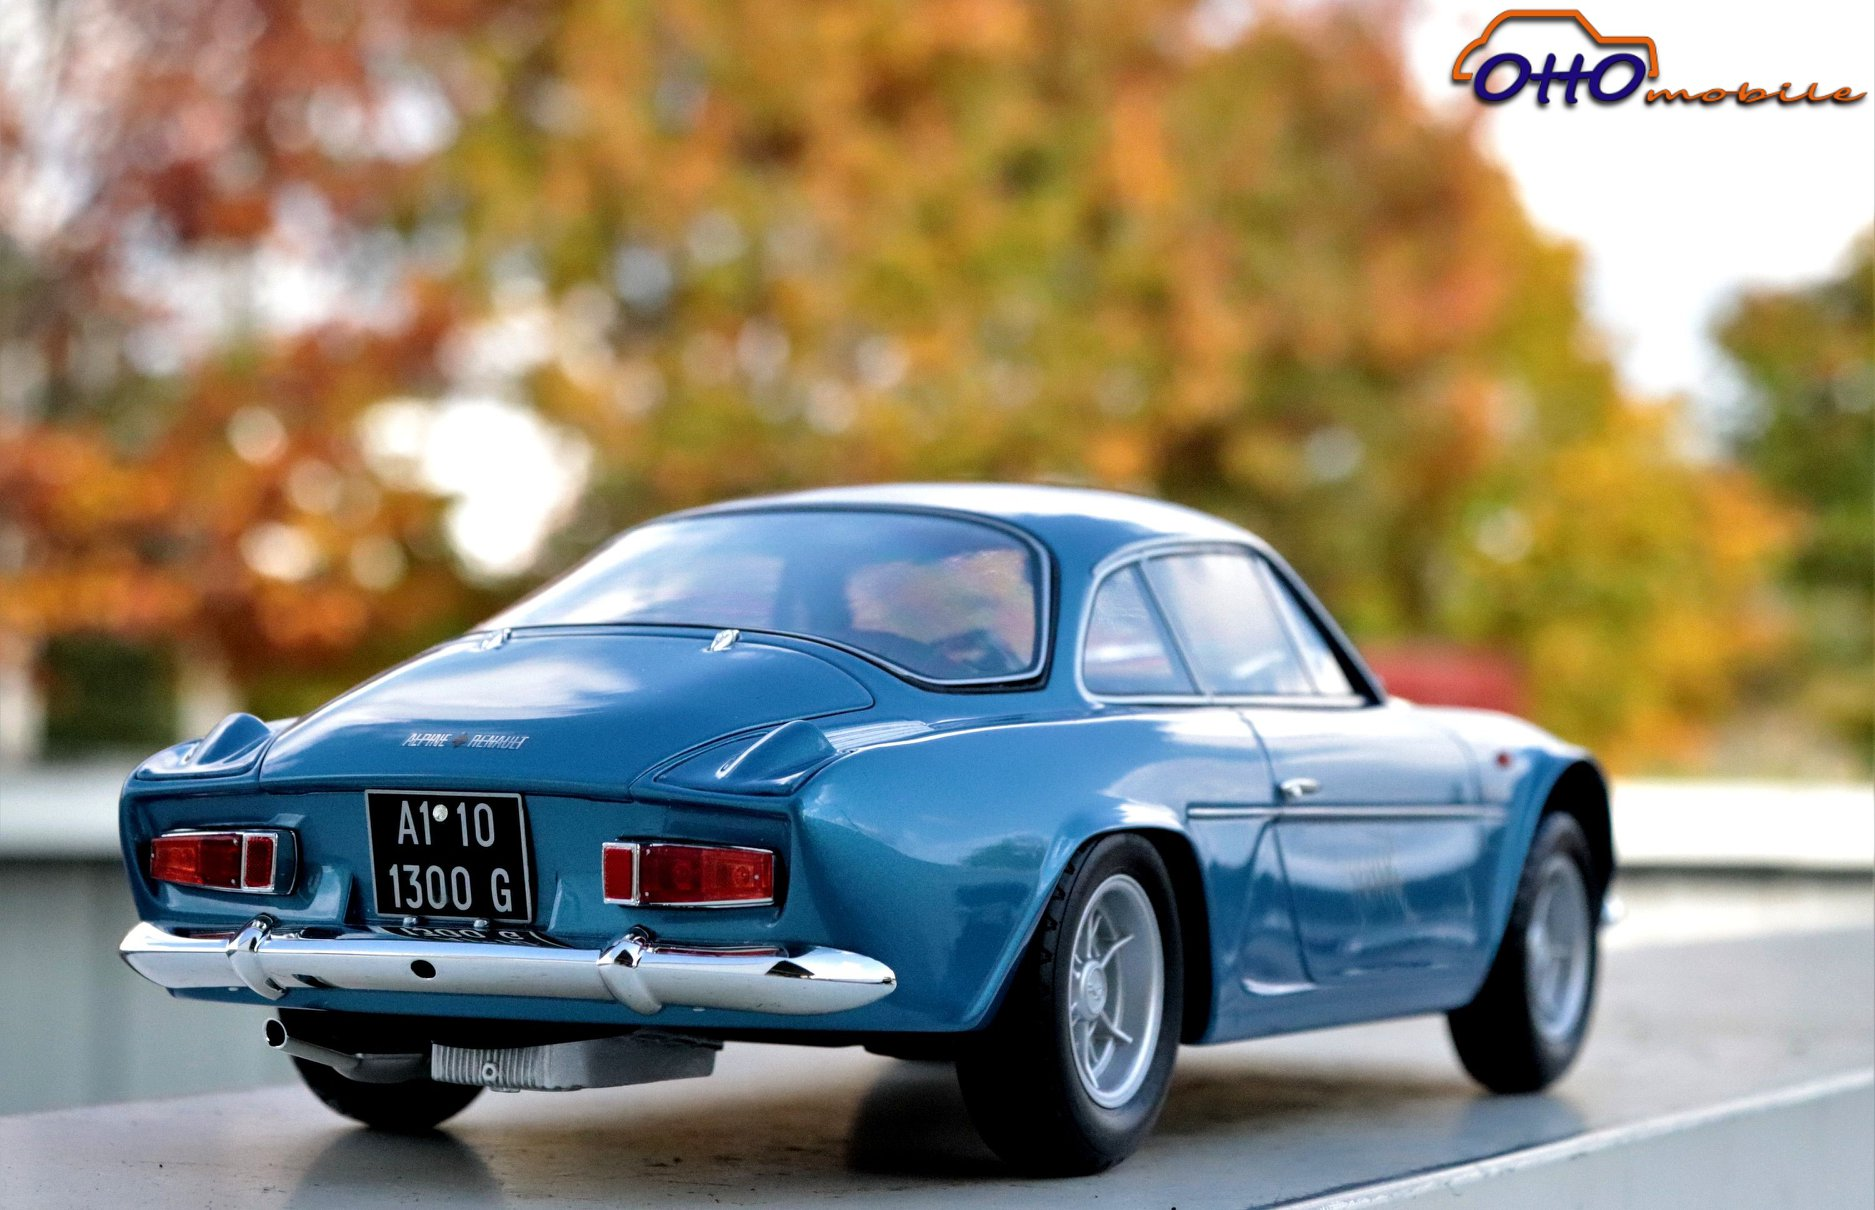 alpine-a110-1300g-ottomobile-g047